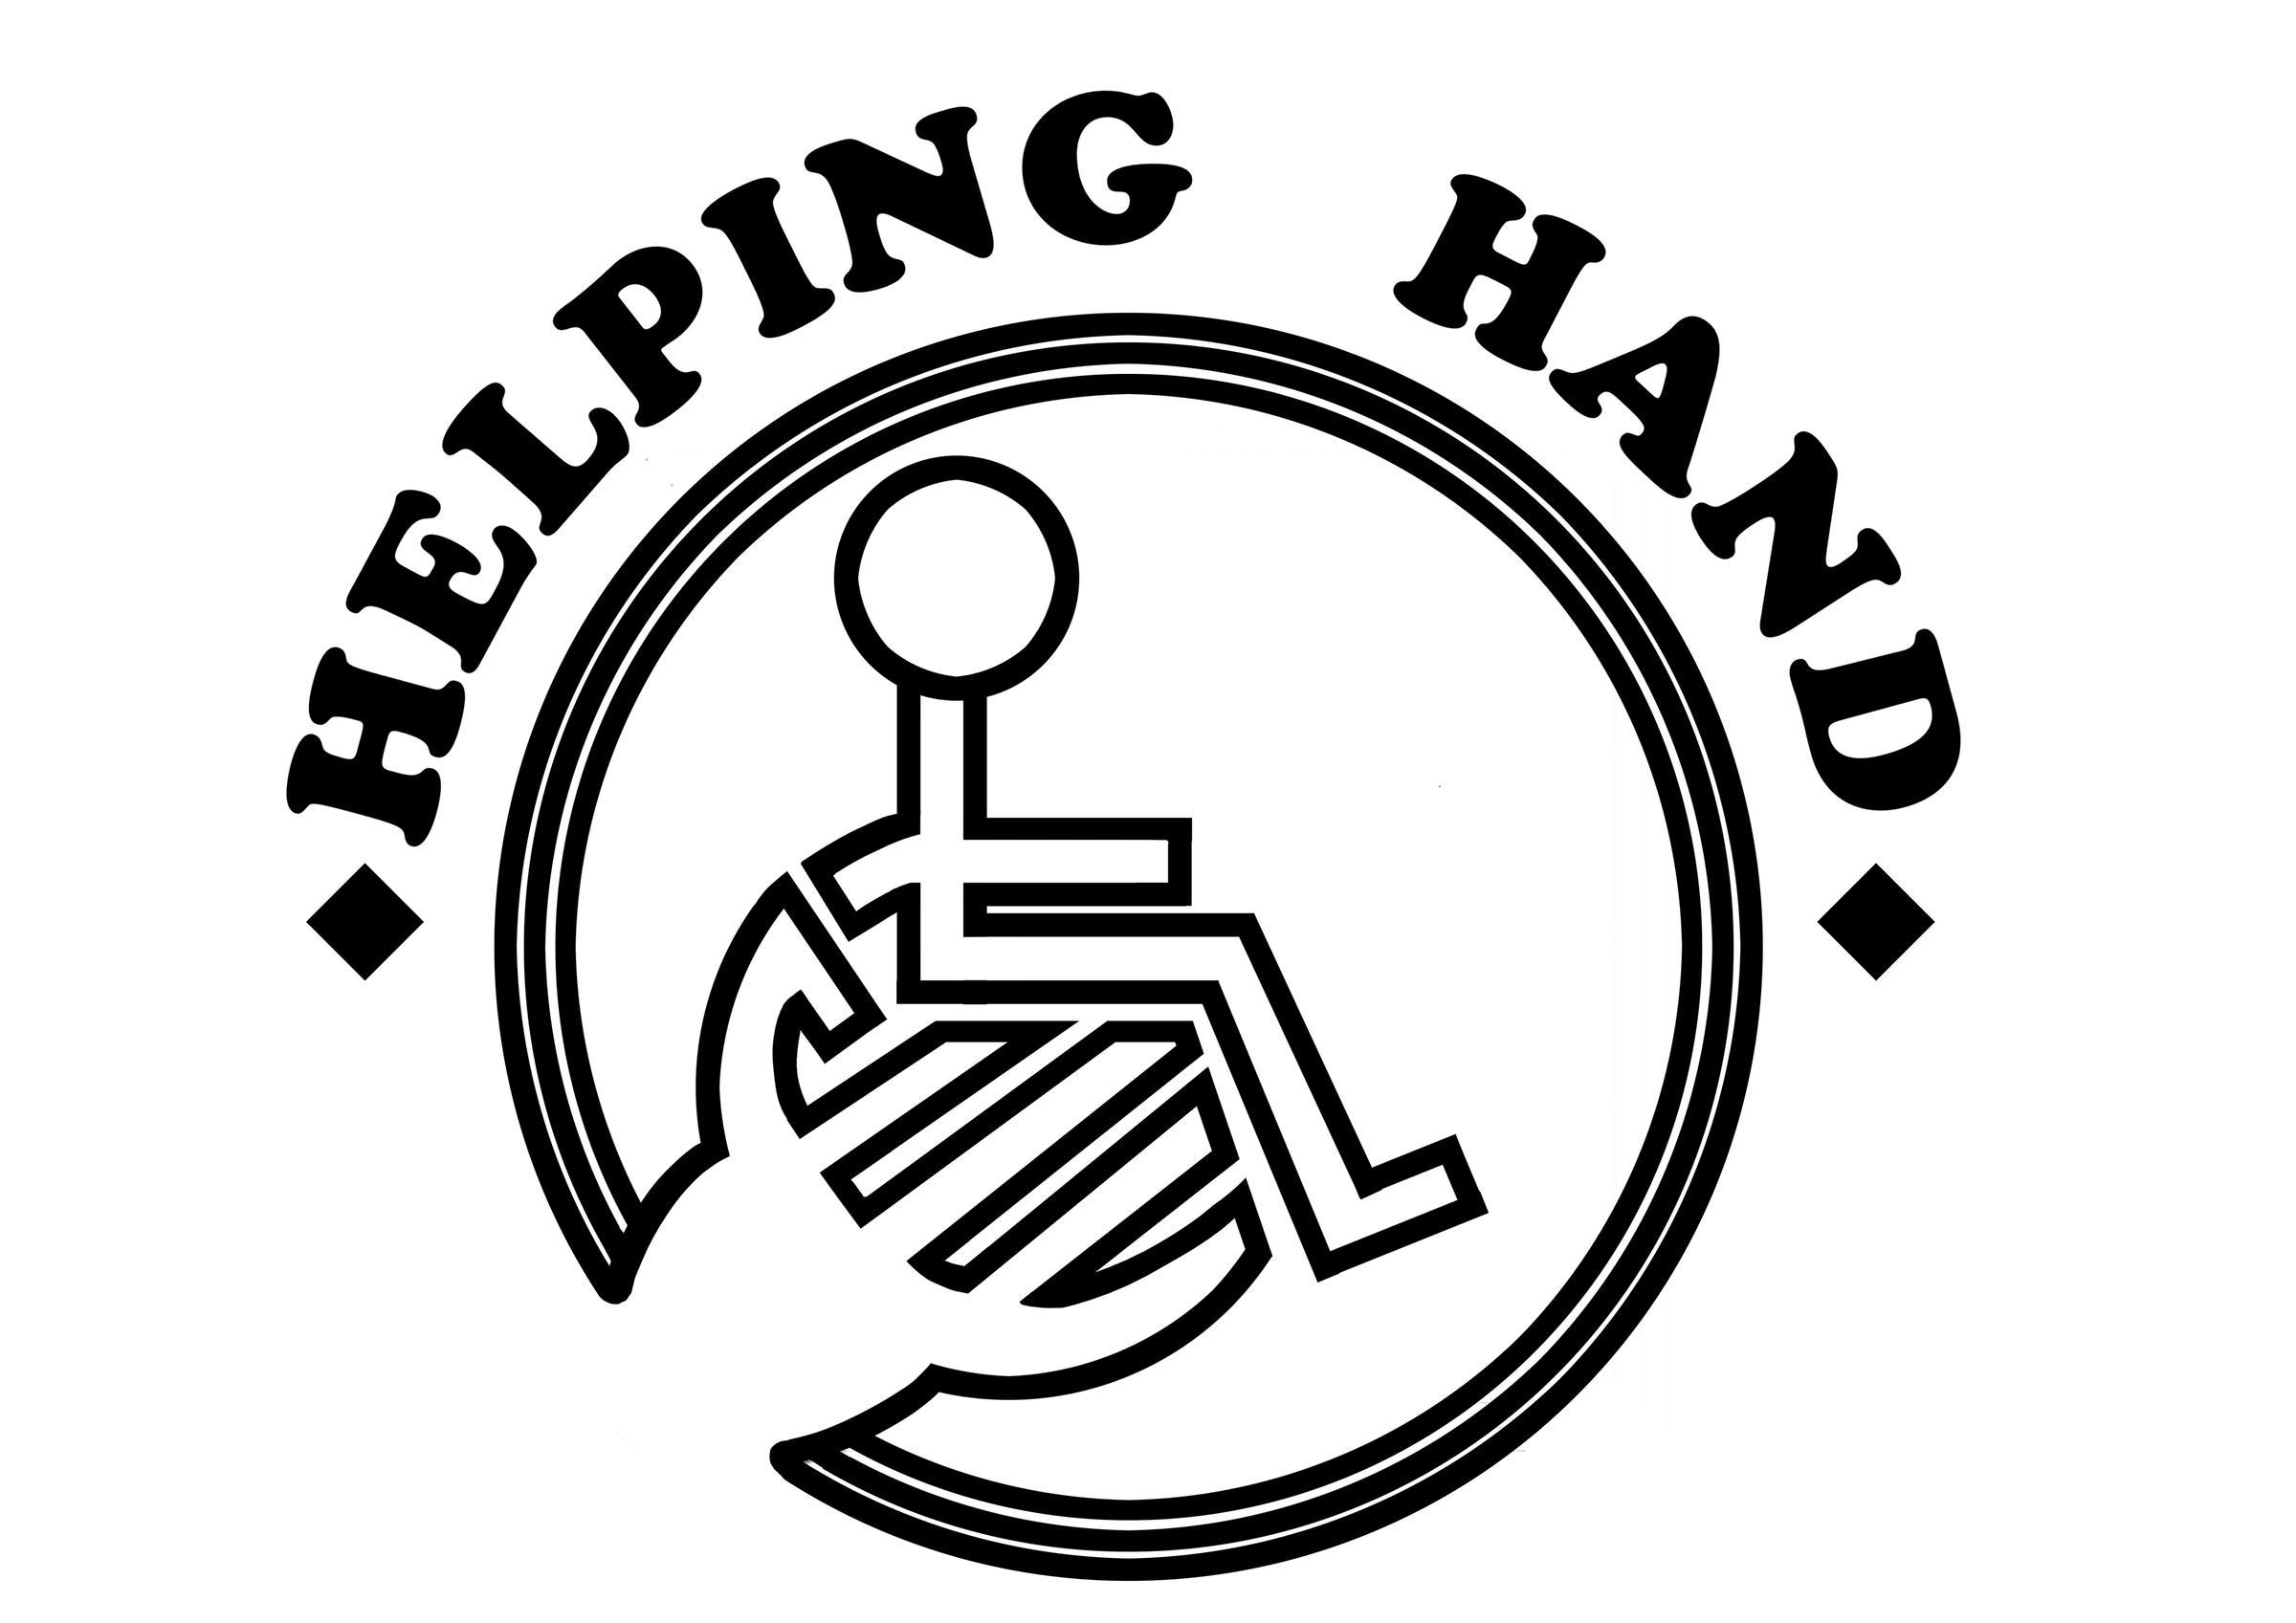 Helping hand salvation army 2017 hawaii public radio helping hand salvation army 2017 biocorpaavc Choice Image